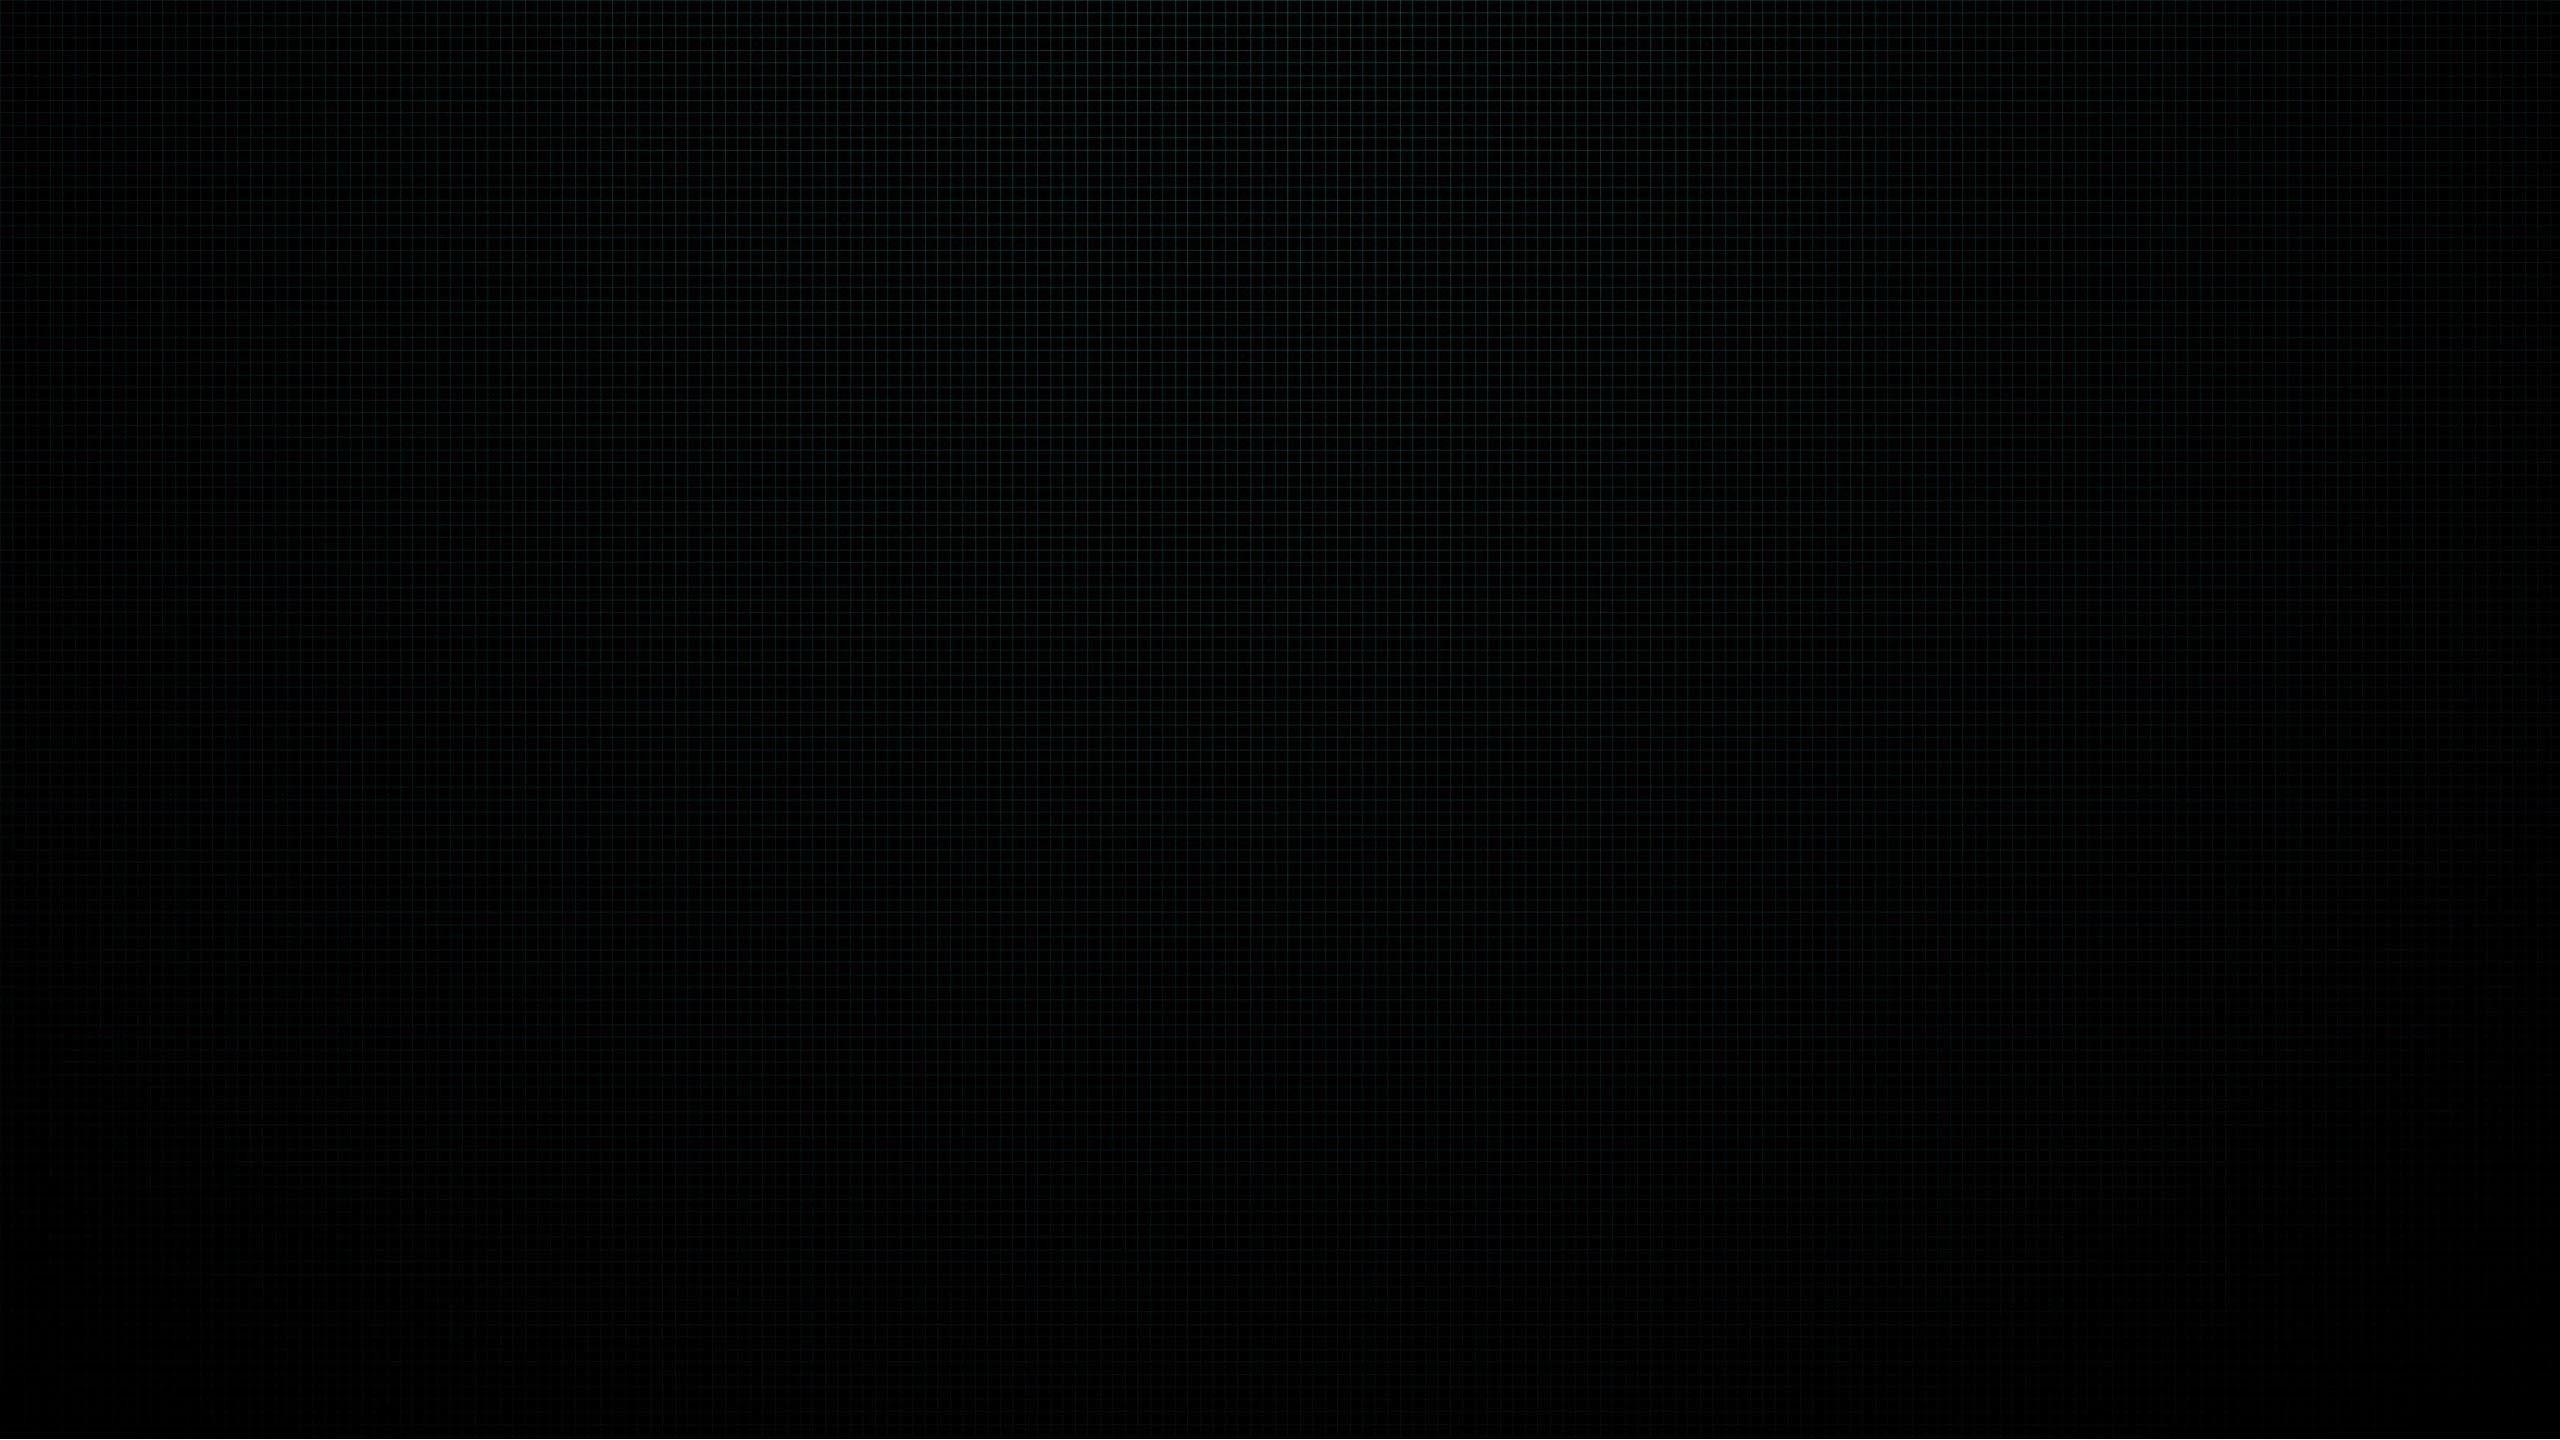 Dark Screen Wallpapers Top Free Dark Screen Backgrounds Wallpaperaccess